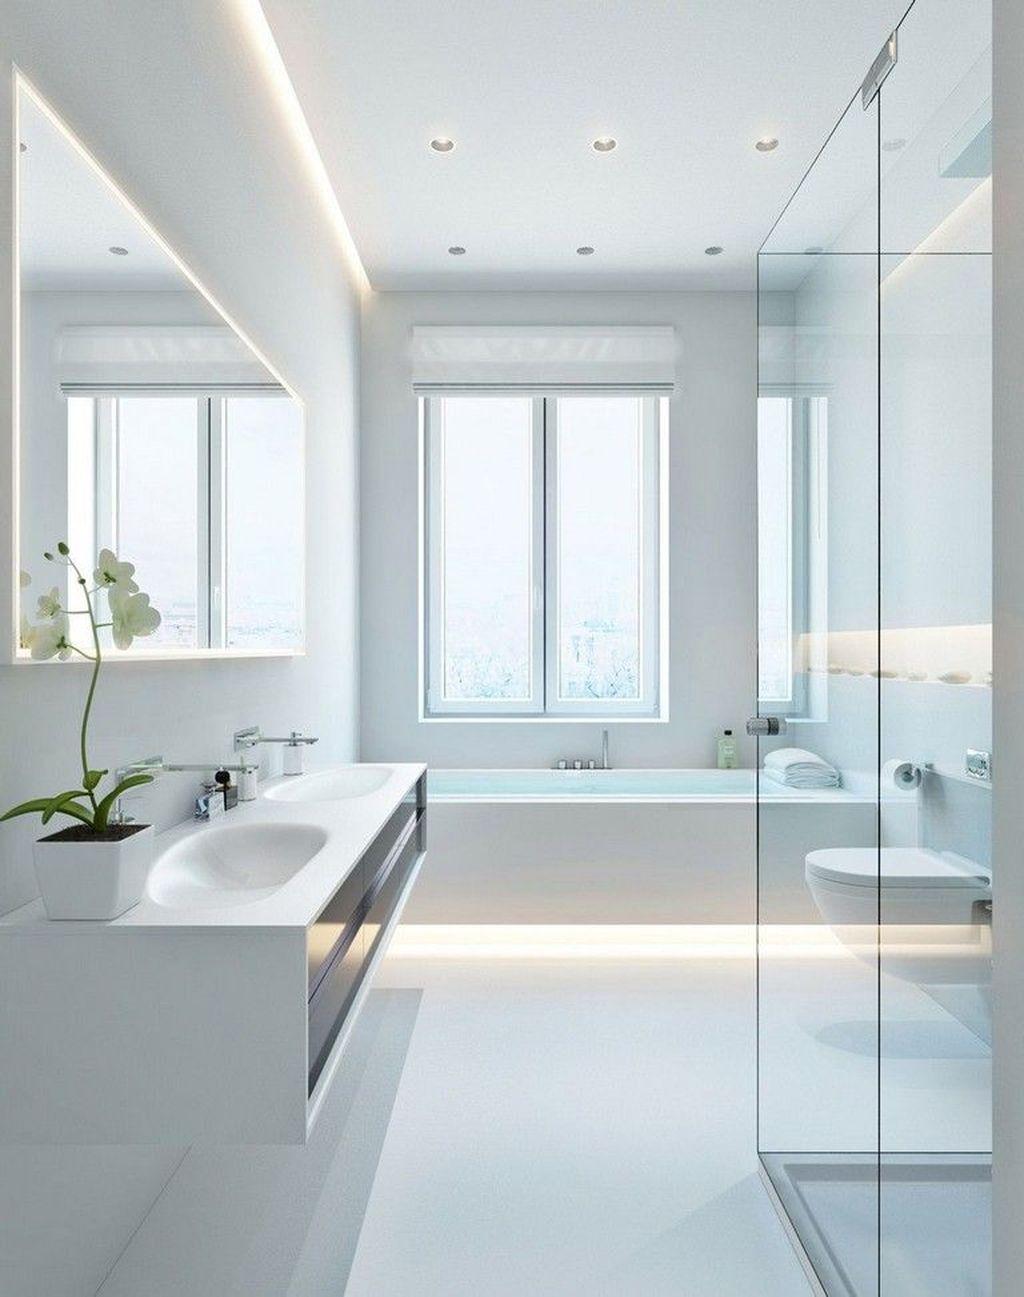 Fabulous Minimalist Bathroom Decor Ideas That Become Everyones Dream 13